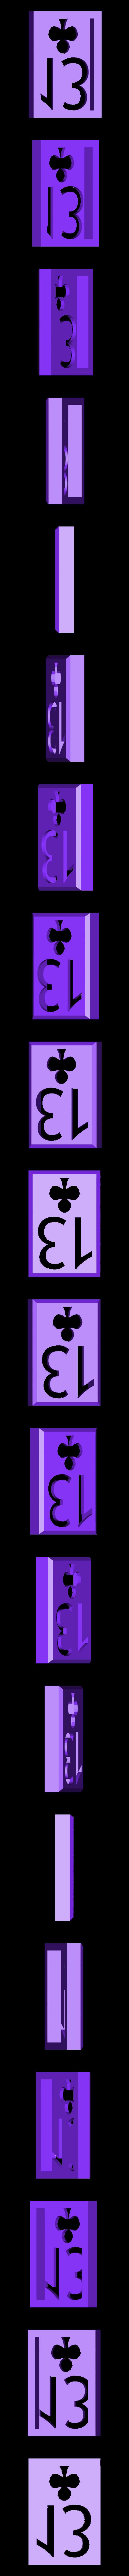 BlockClubs13.stl Download STL file Playing Card Tiles • Object to 3D print, Jinja